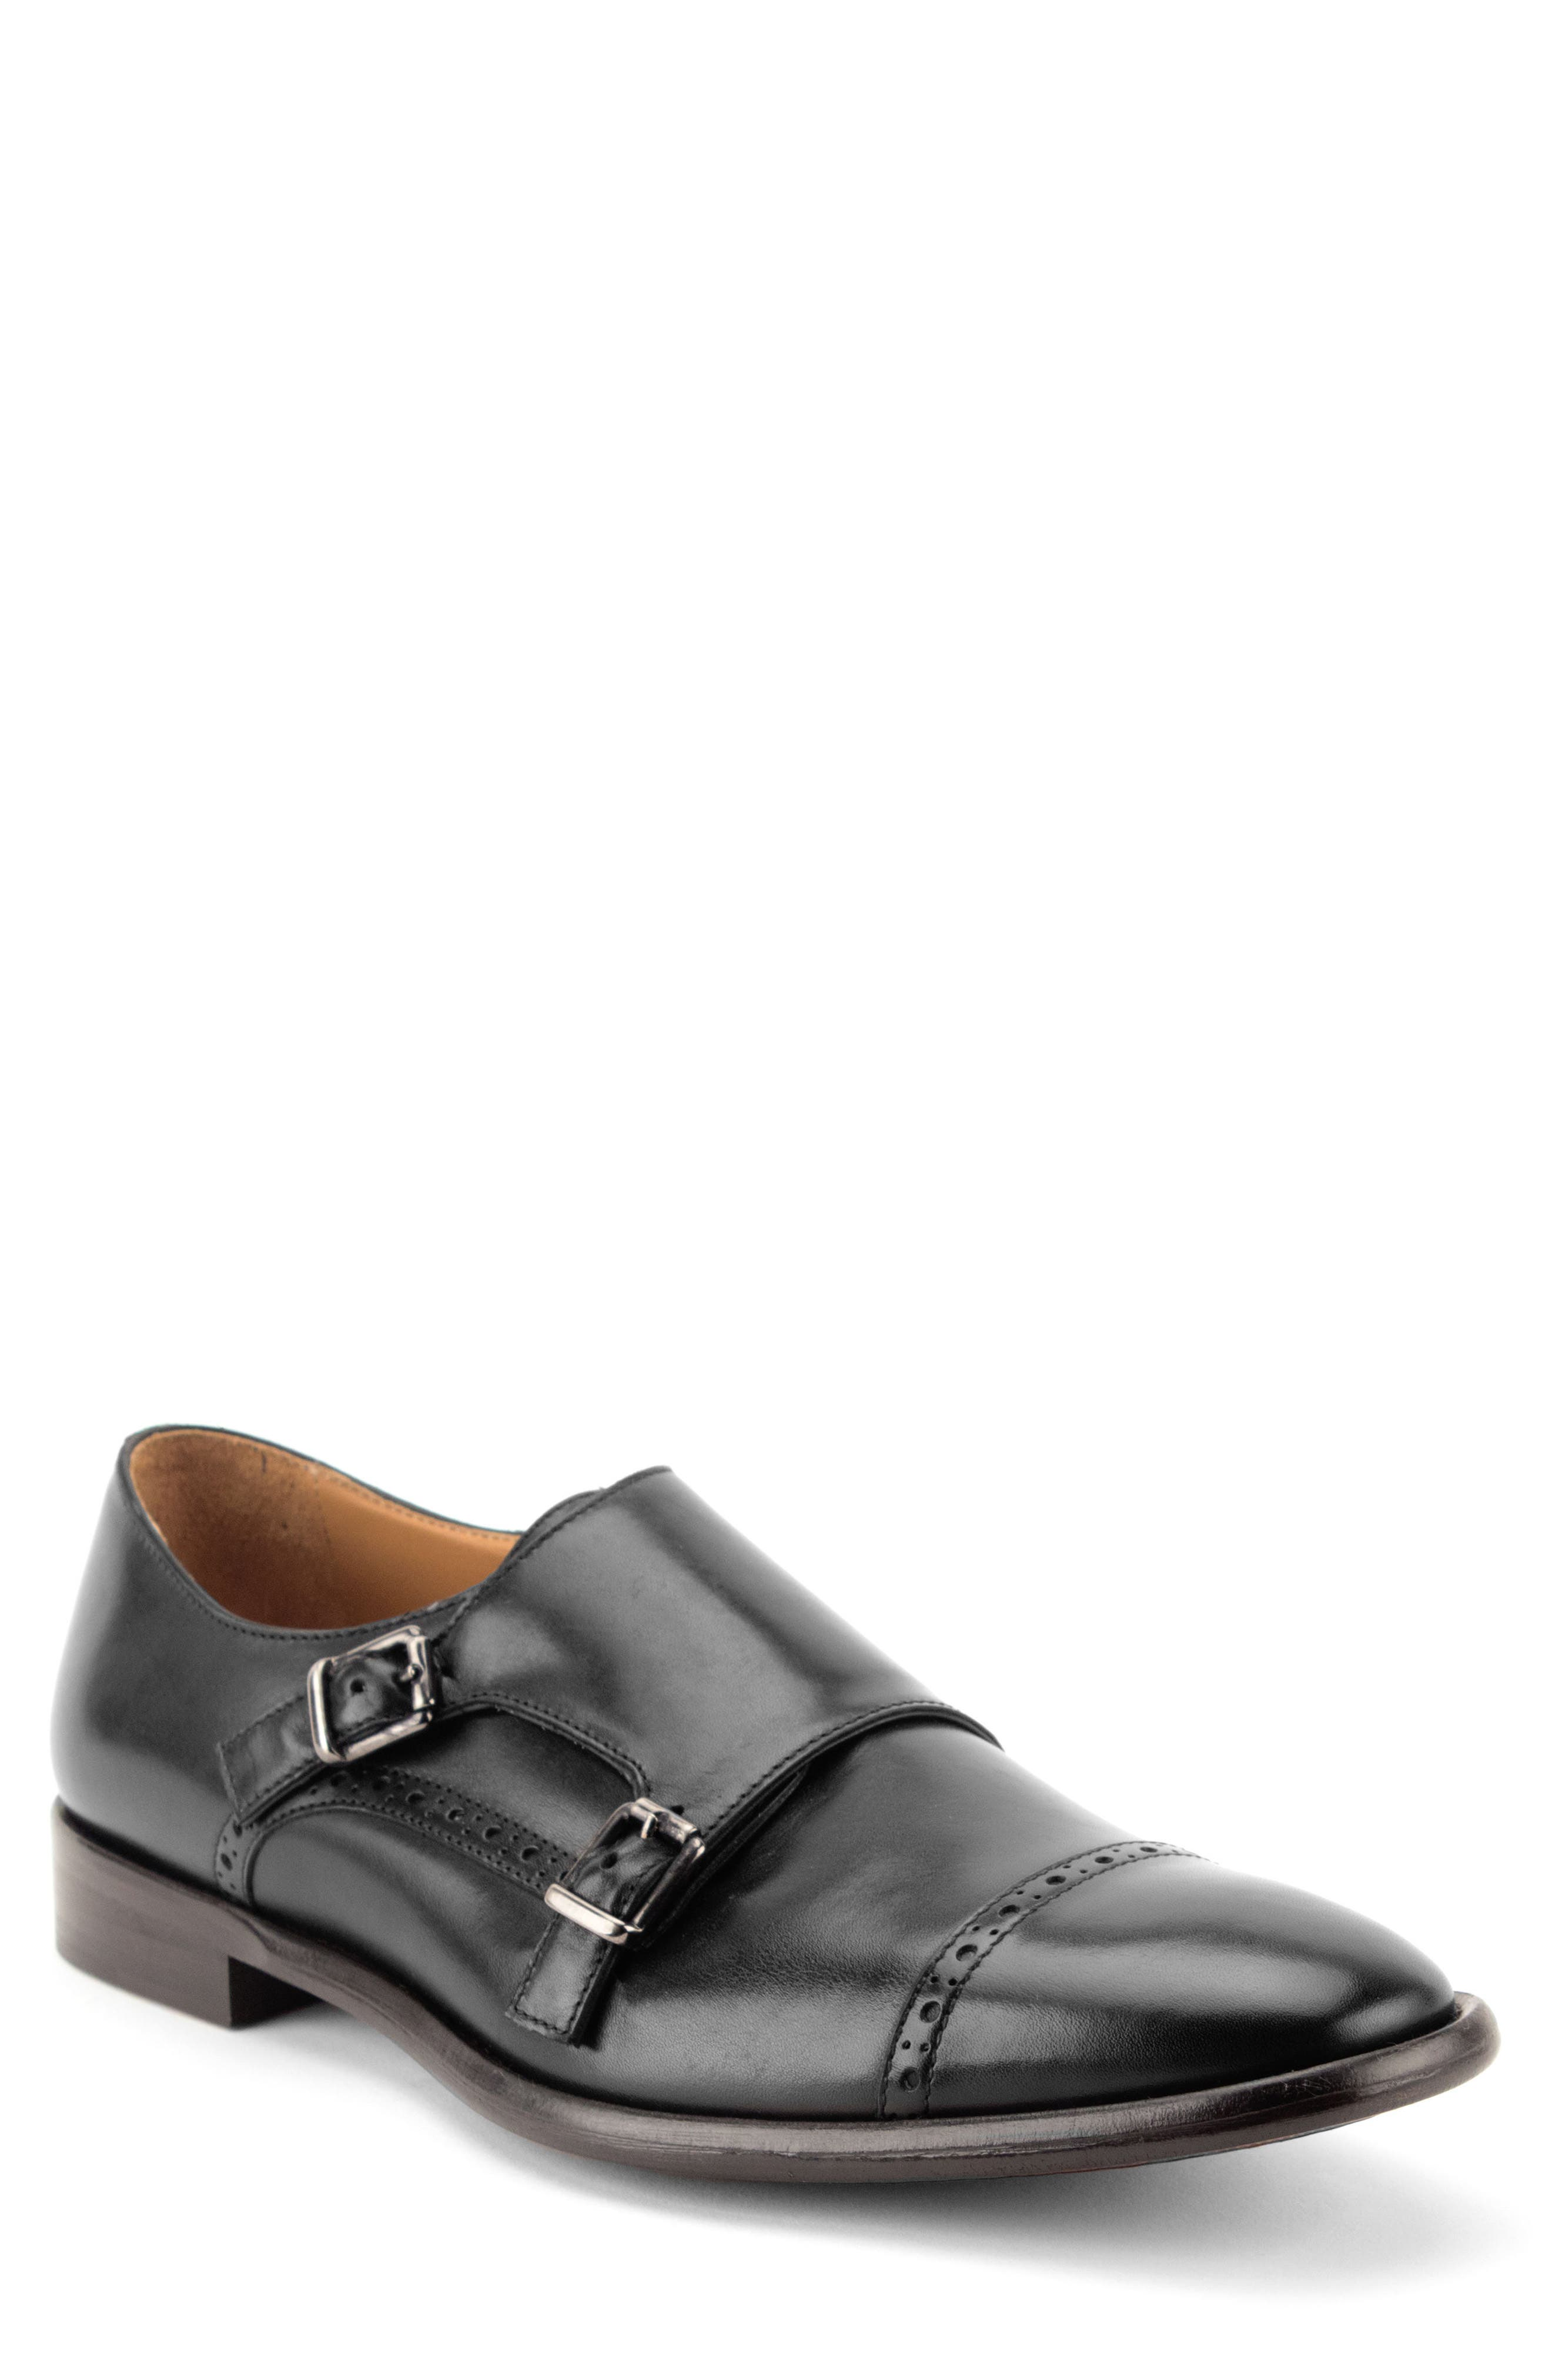 Corbett Cap Toe Double Strap Monk Shoe,                             Main thumbnail 1, color,                             001